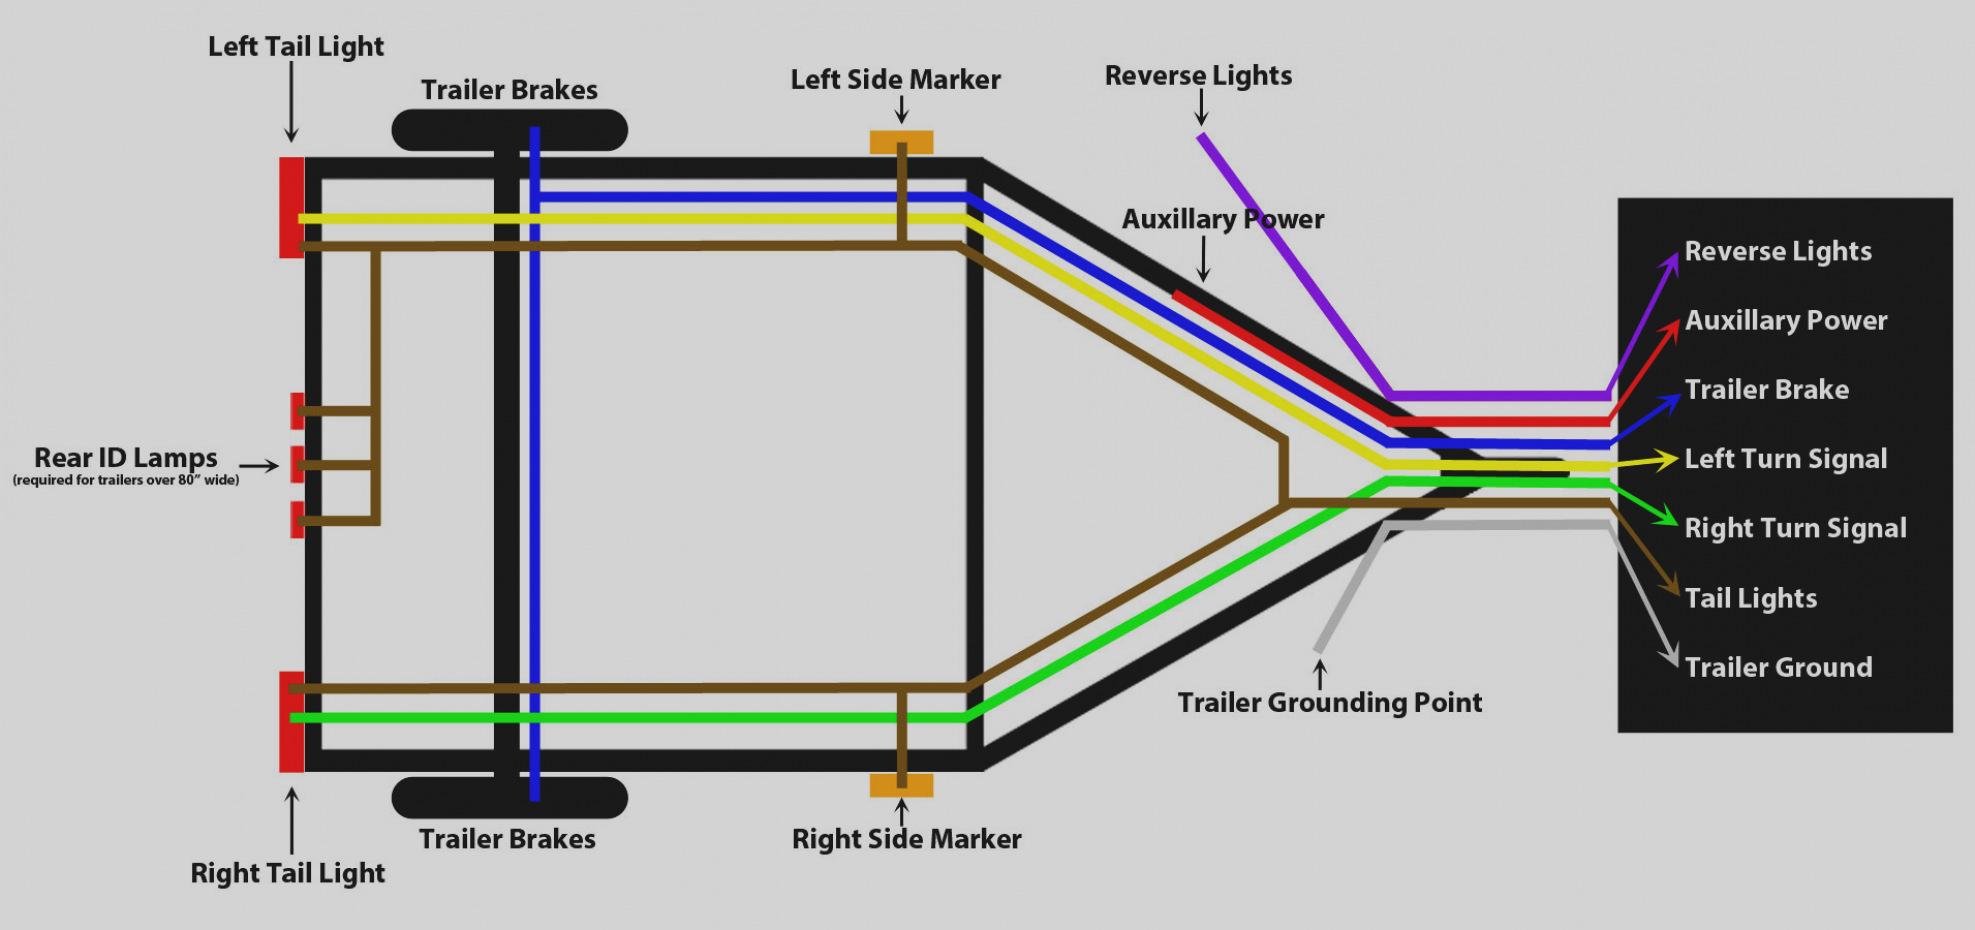 Prong Wire Trailer Plug Wiring Diagram on 7 flat wiring diagram, 7 round trailer plug diagram, seven wire trailer plug diagram, 7 prong trailer wiring diagram, 2 prong plug hook up diagram, rv plug diagram, 7-wire rv wiring diagram, 7 wire connector wiring diagram, 4 prong trailer wiring harness diagram, gmc truck trailer plug diagram,